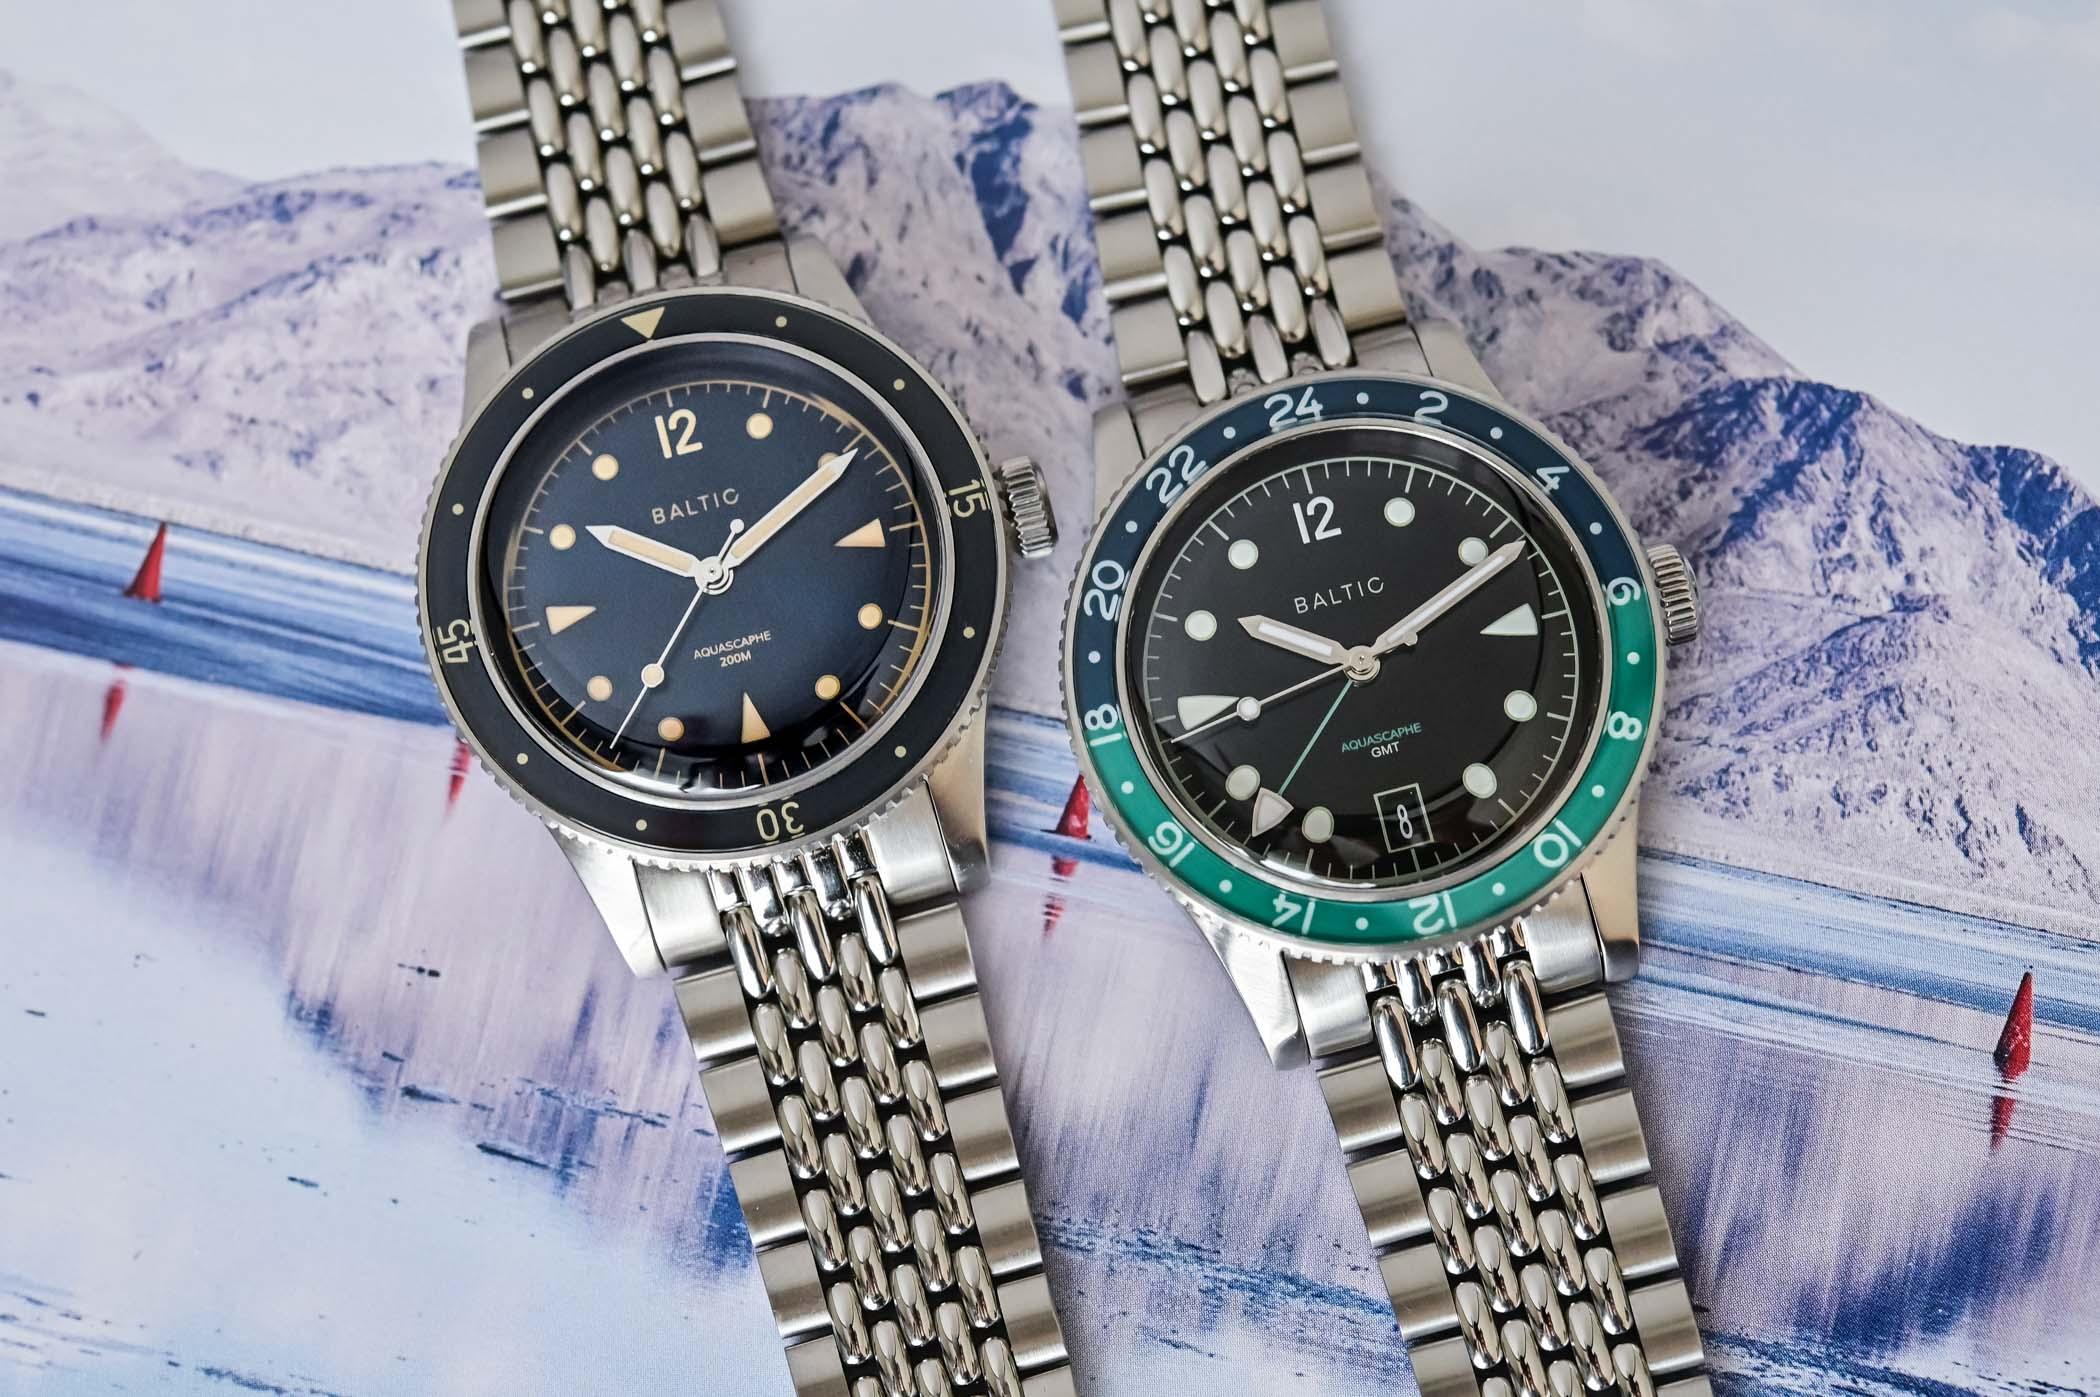 Baltic-Aquascaphe-GMT-Review-1.jpg